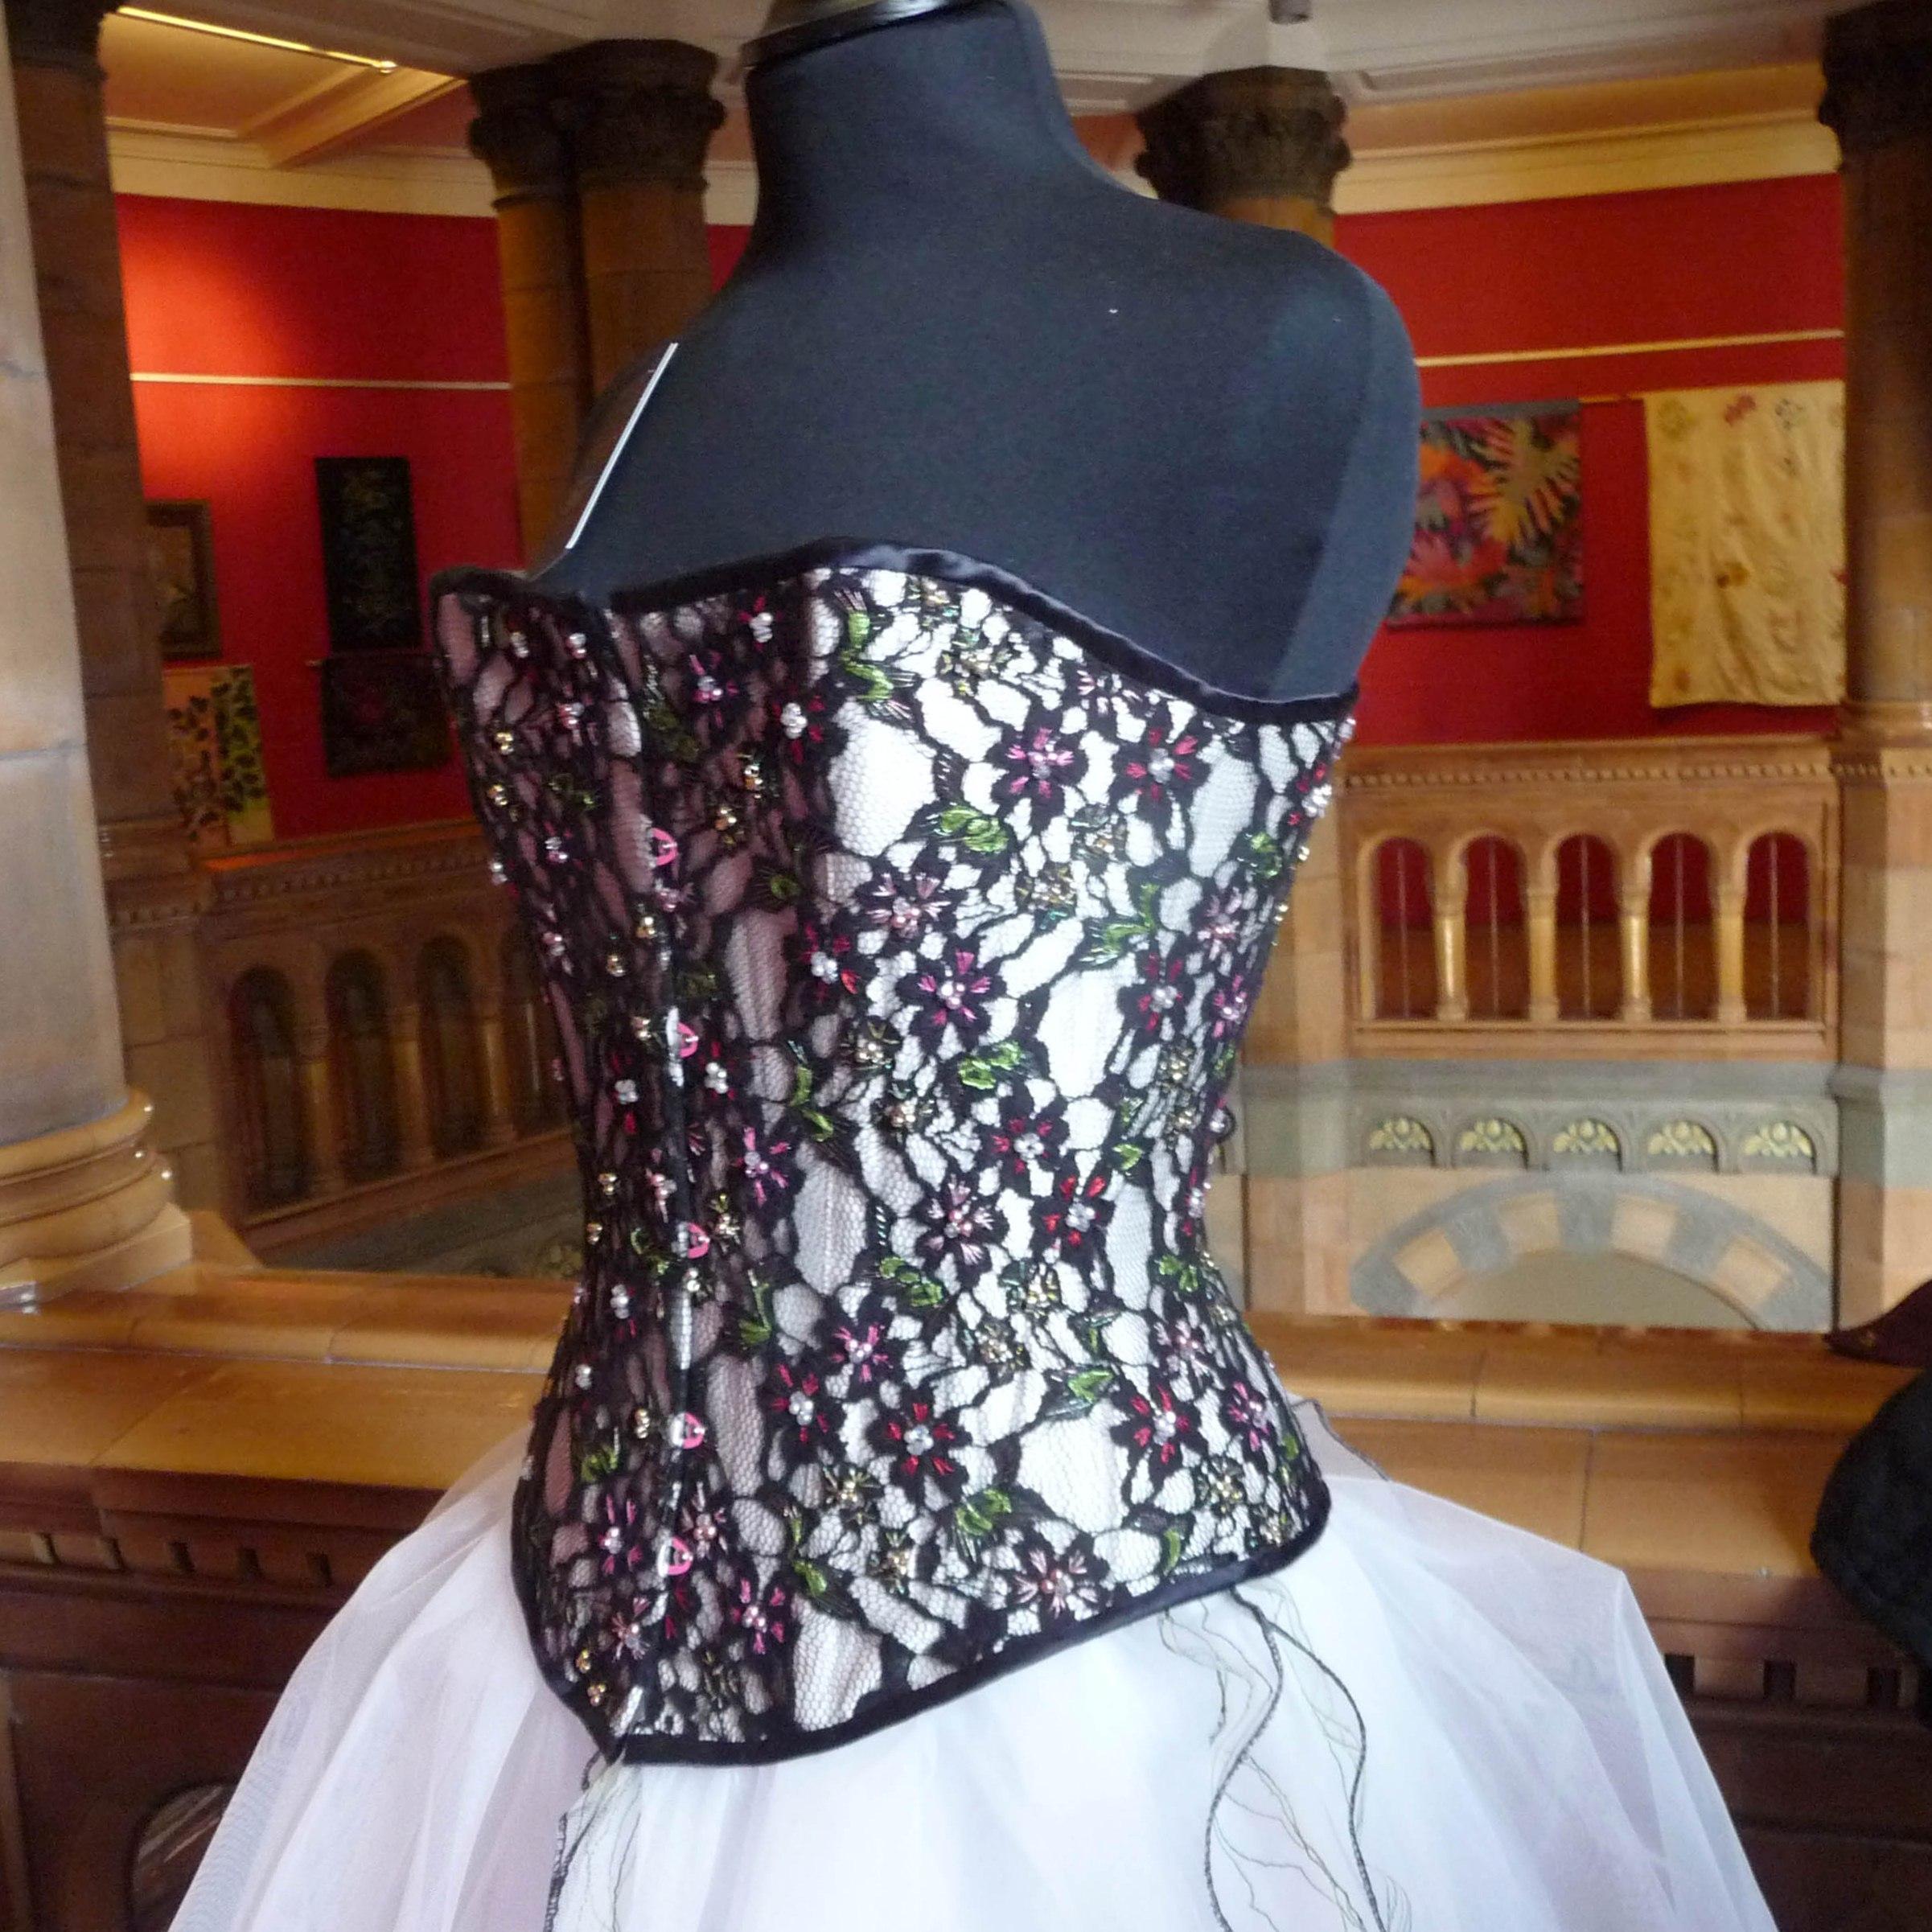 CORSET (detail), 2014, Gill Roberts & Belladonna, free machine, beads & bespoke